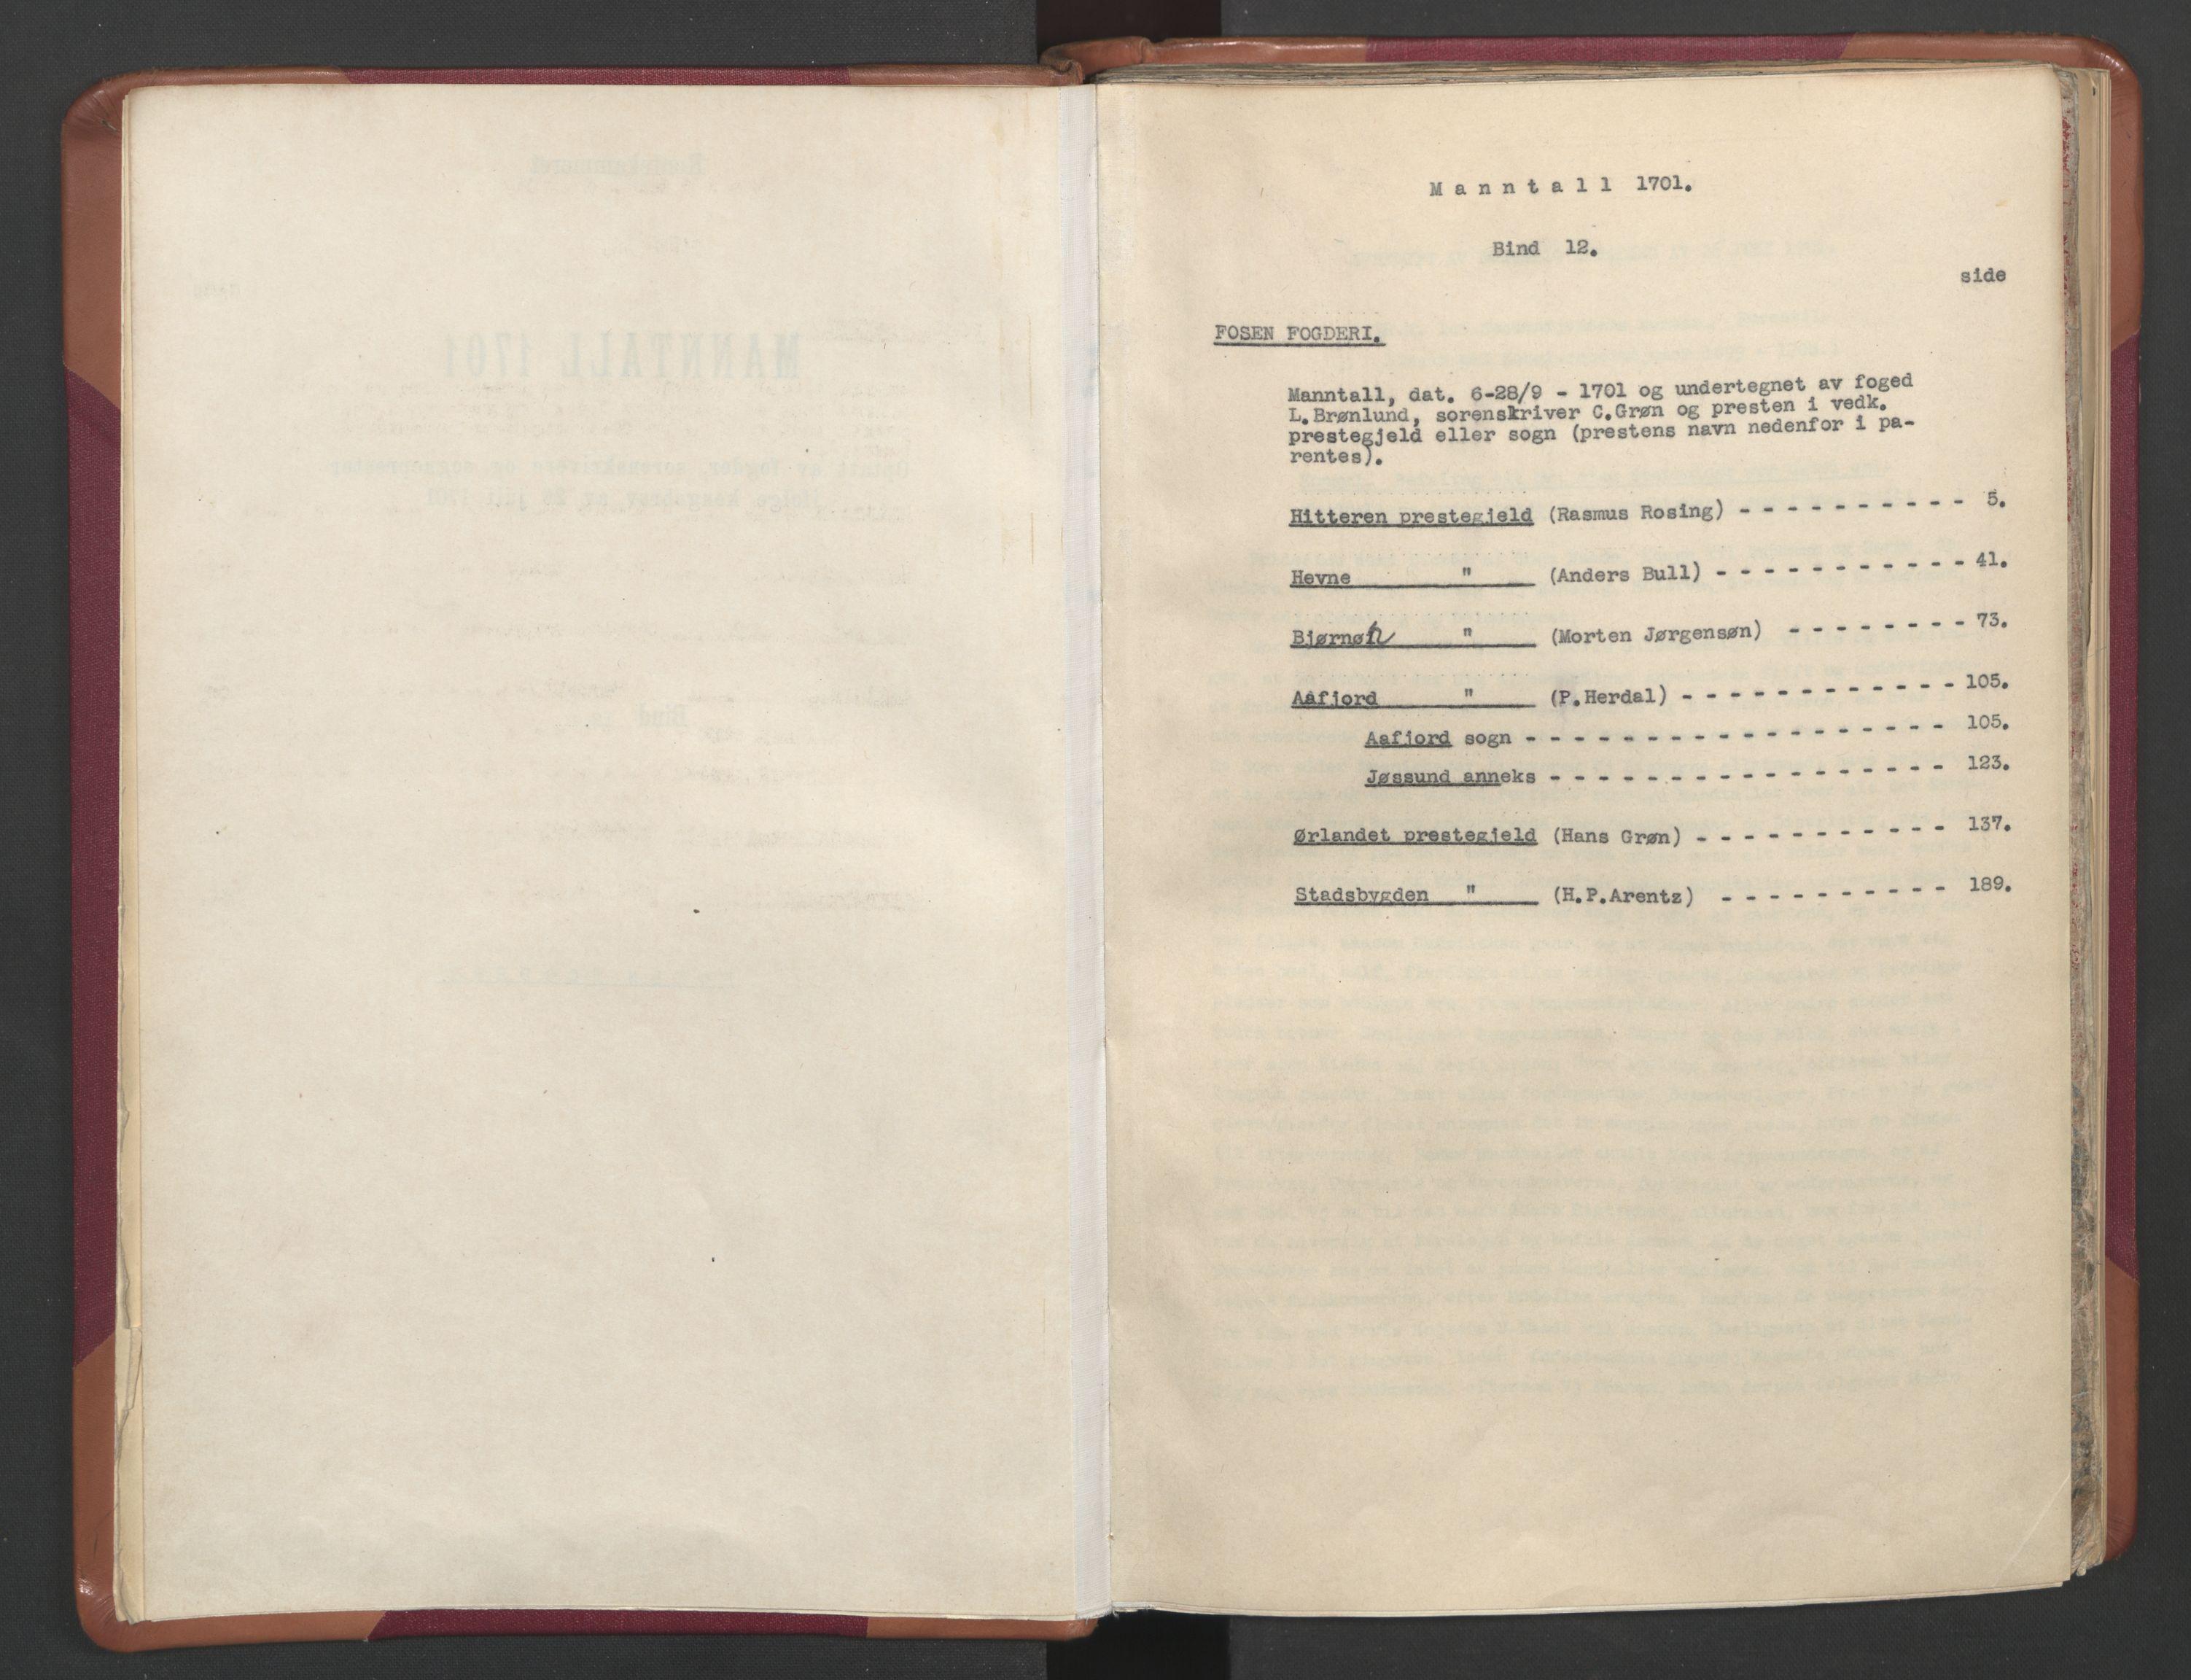 RA, Manntallet 1701, nr. 12: Fosen fogderi, 1701, s. upaginert